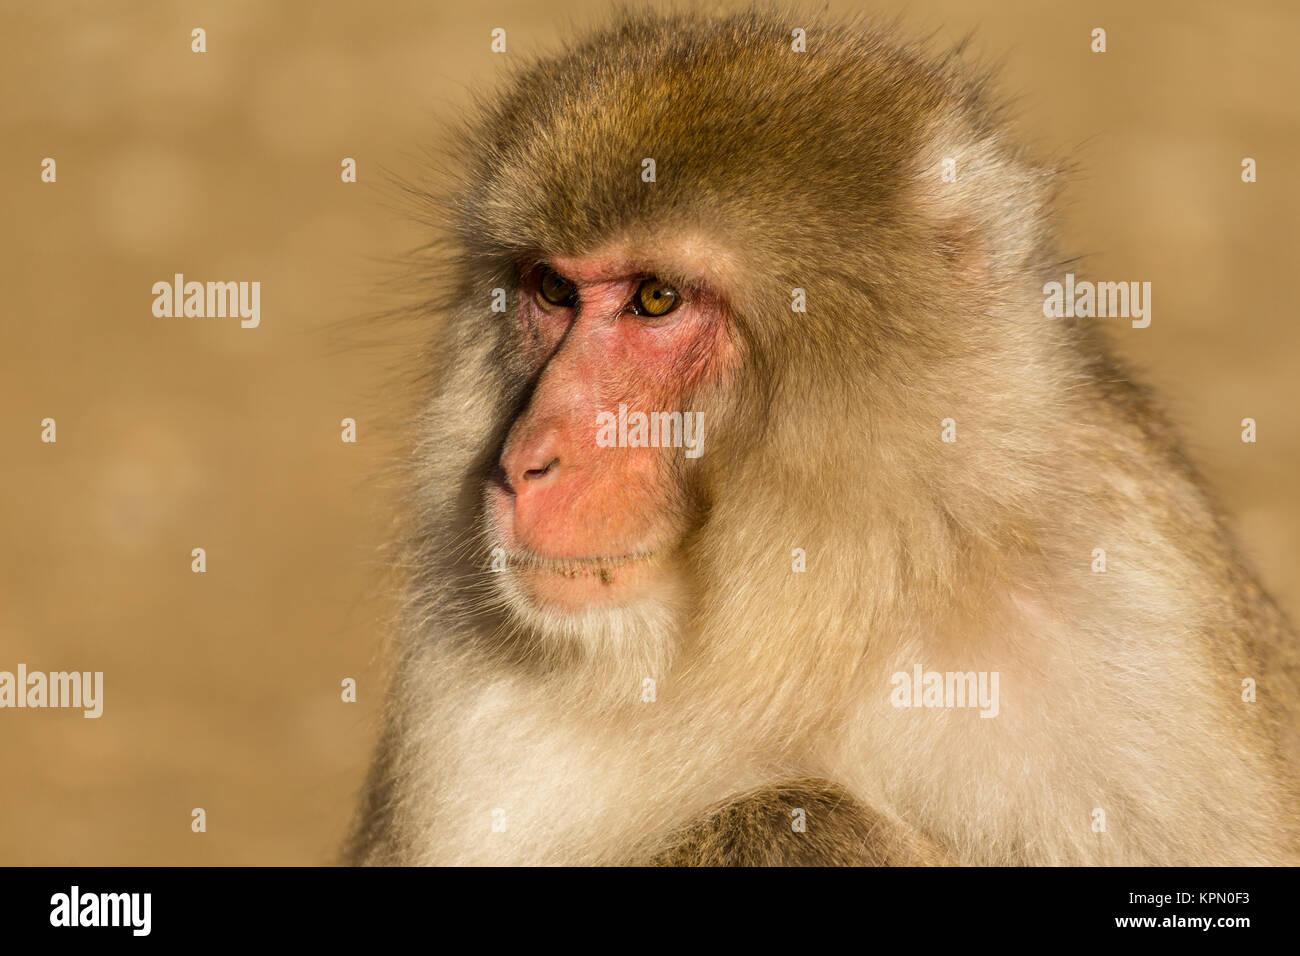 Monkey in wild life Stock Photo